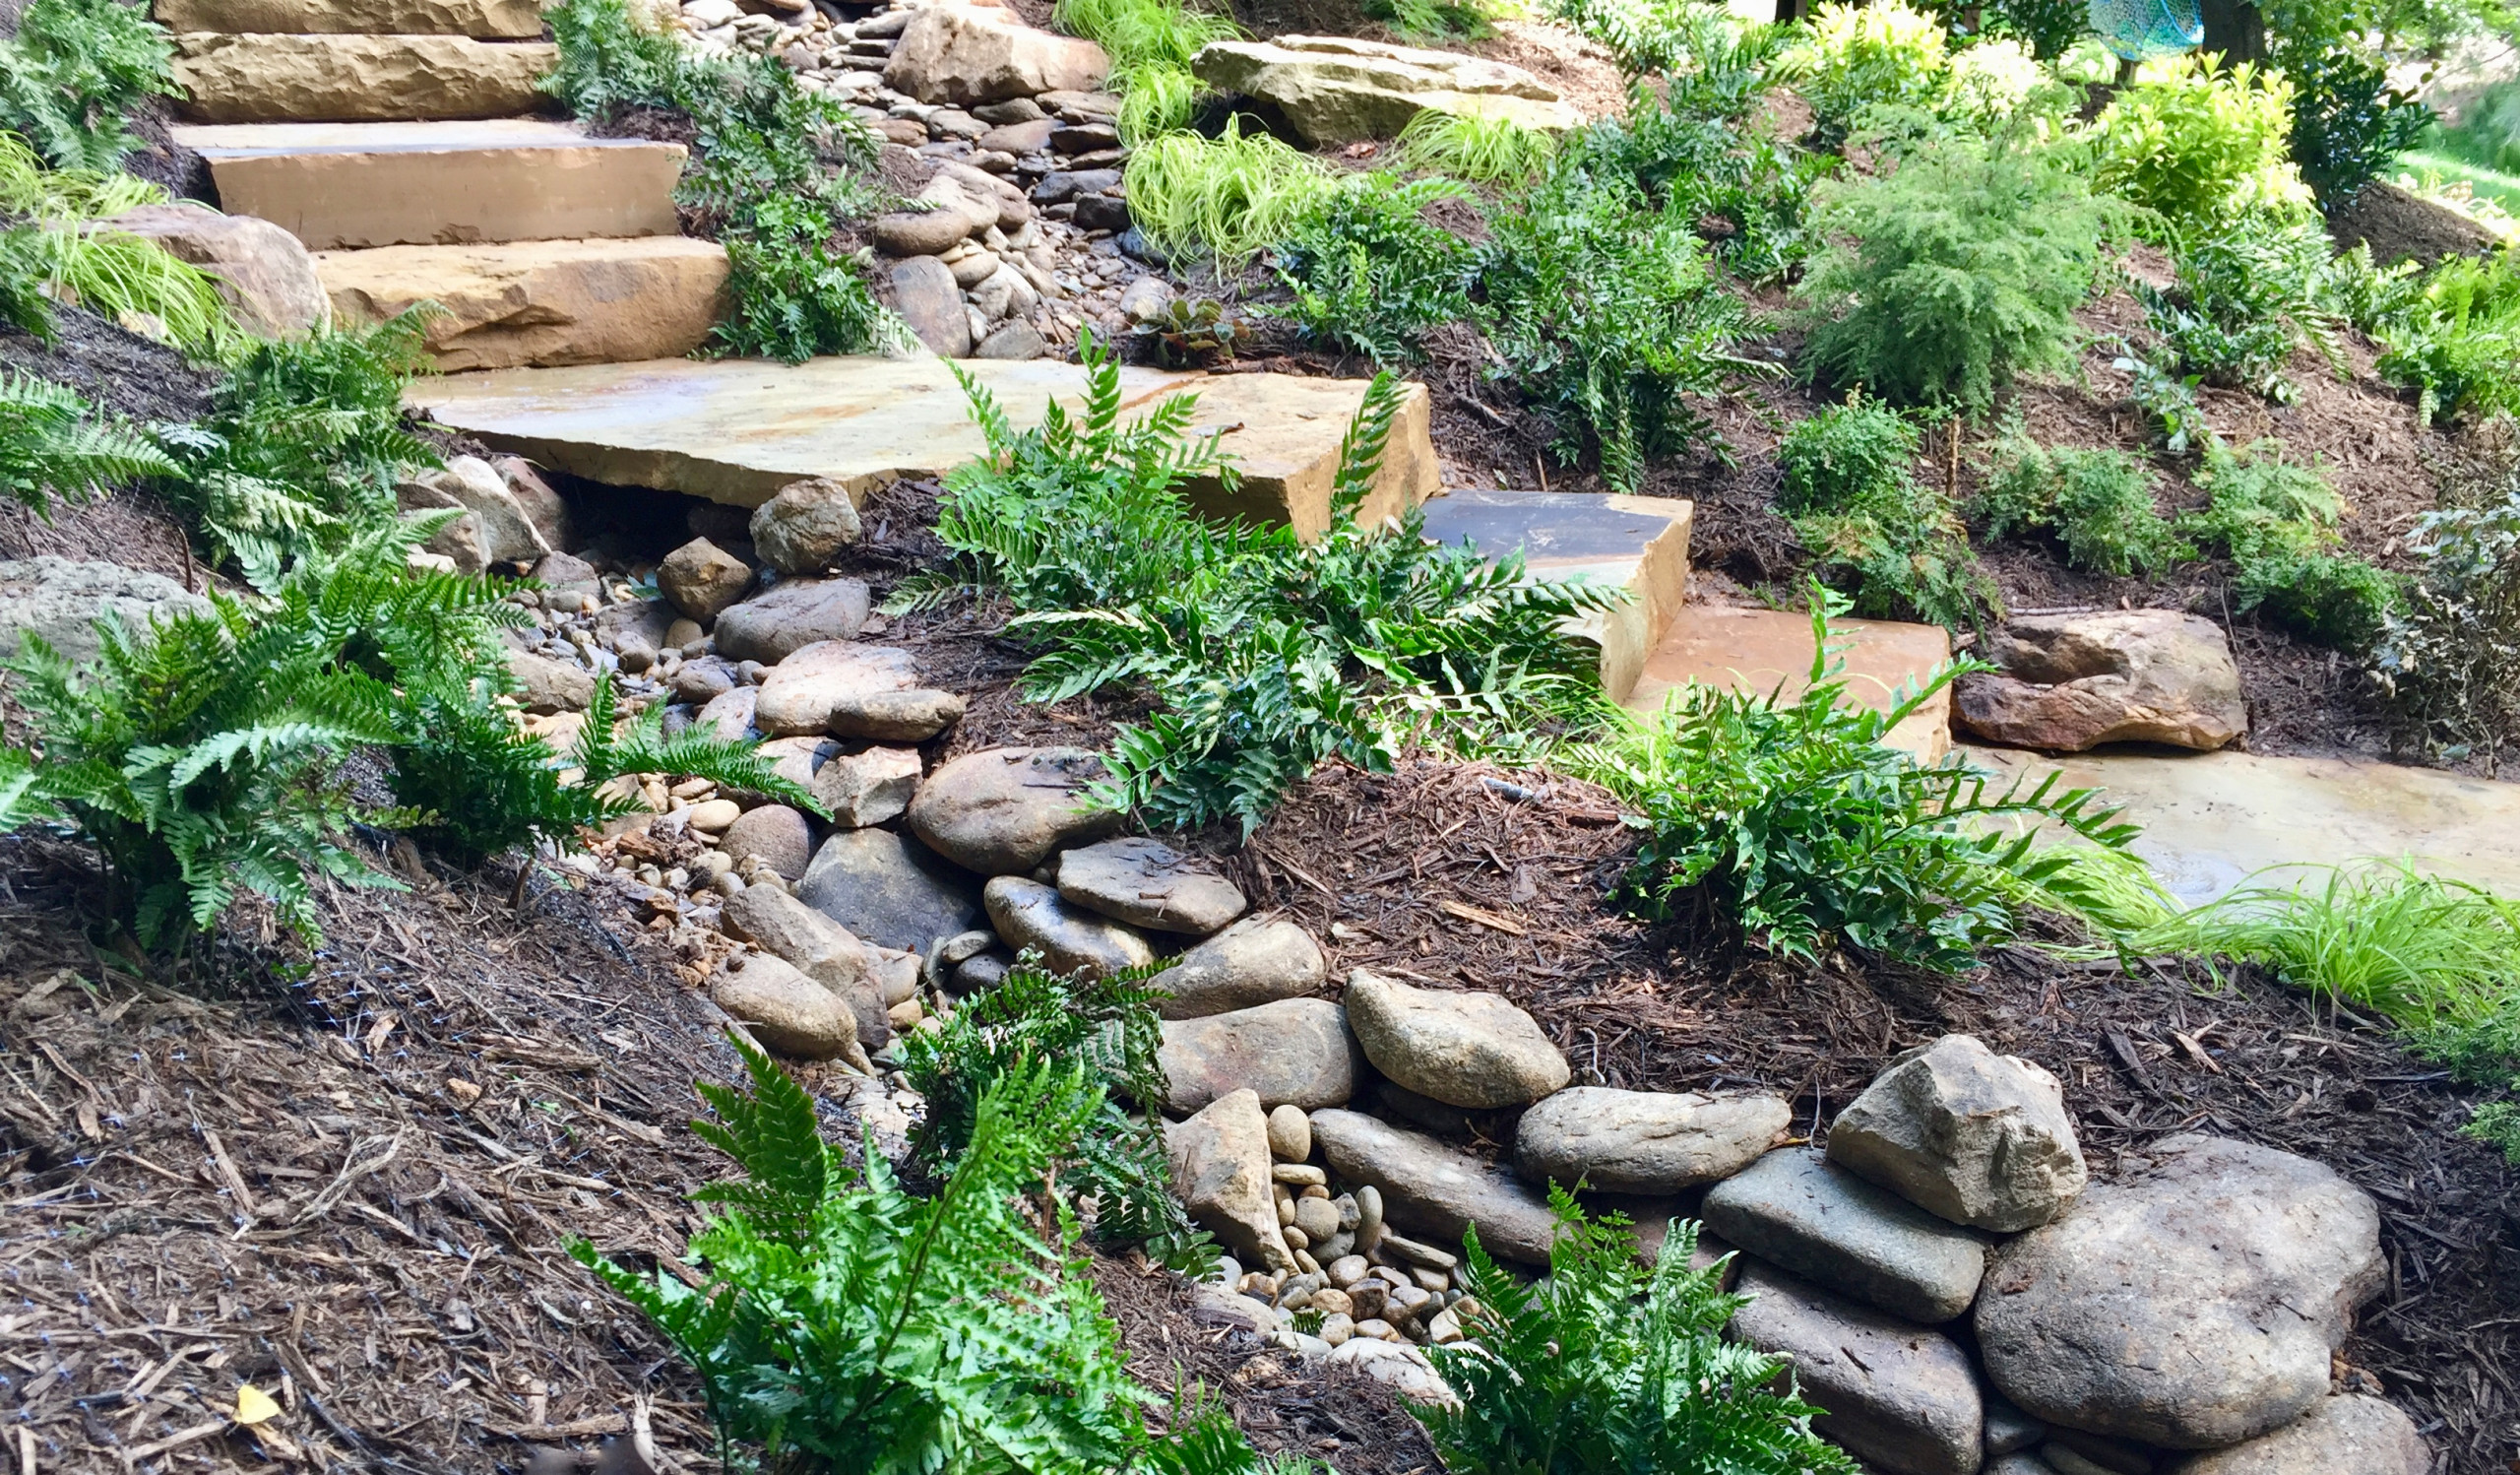 Creek bed under stone slab bridge